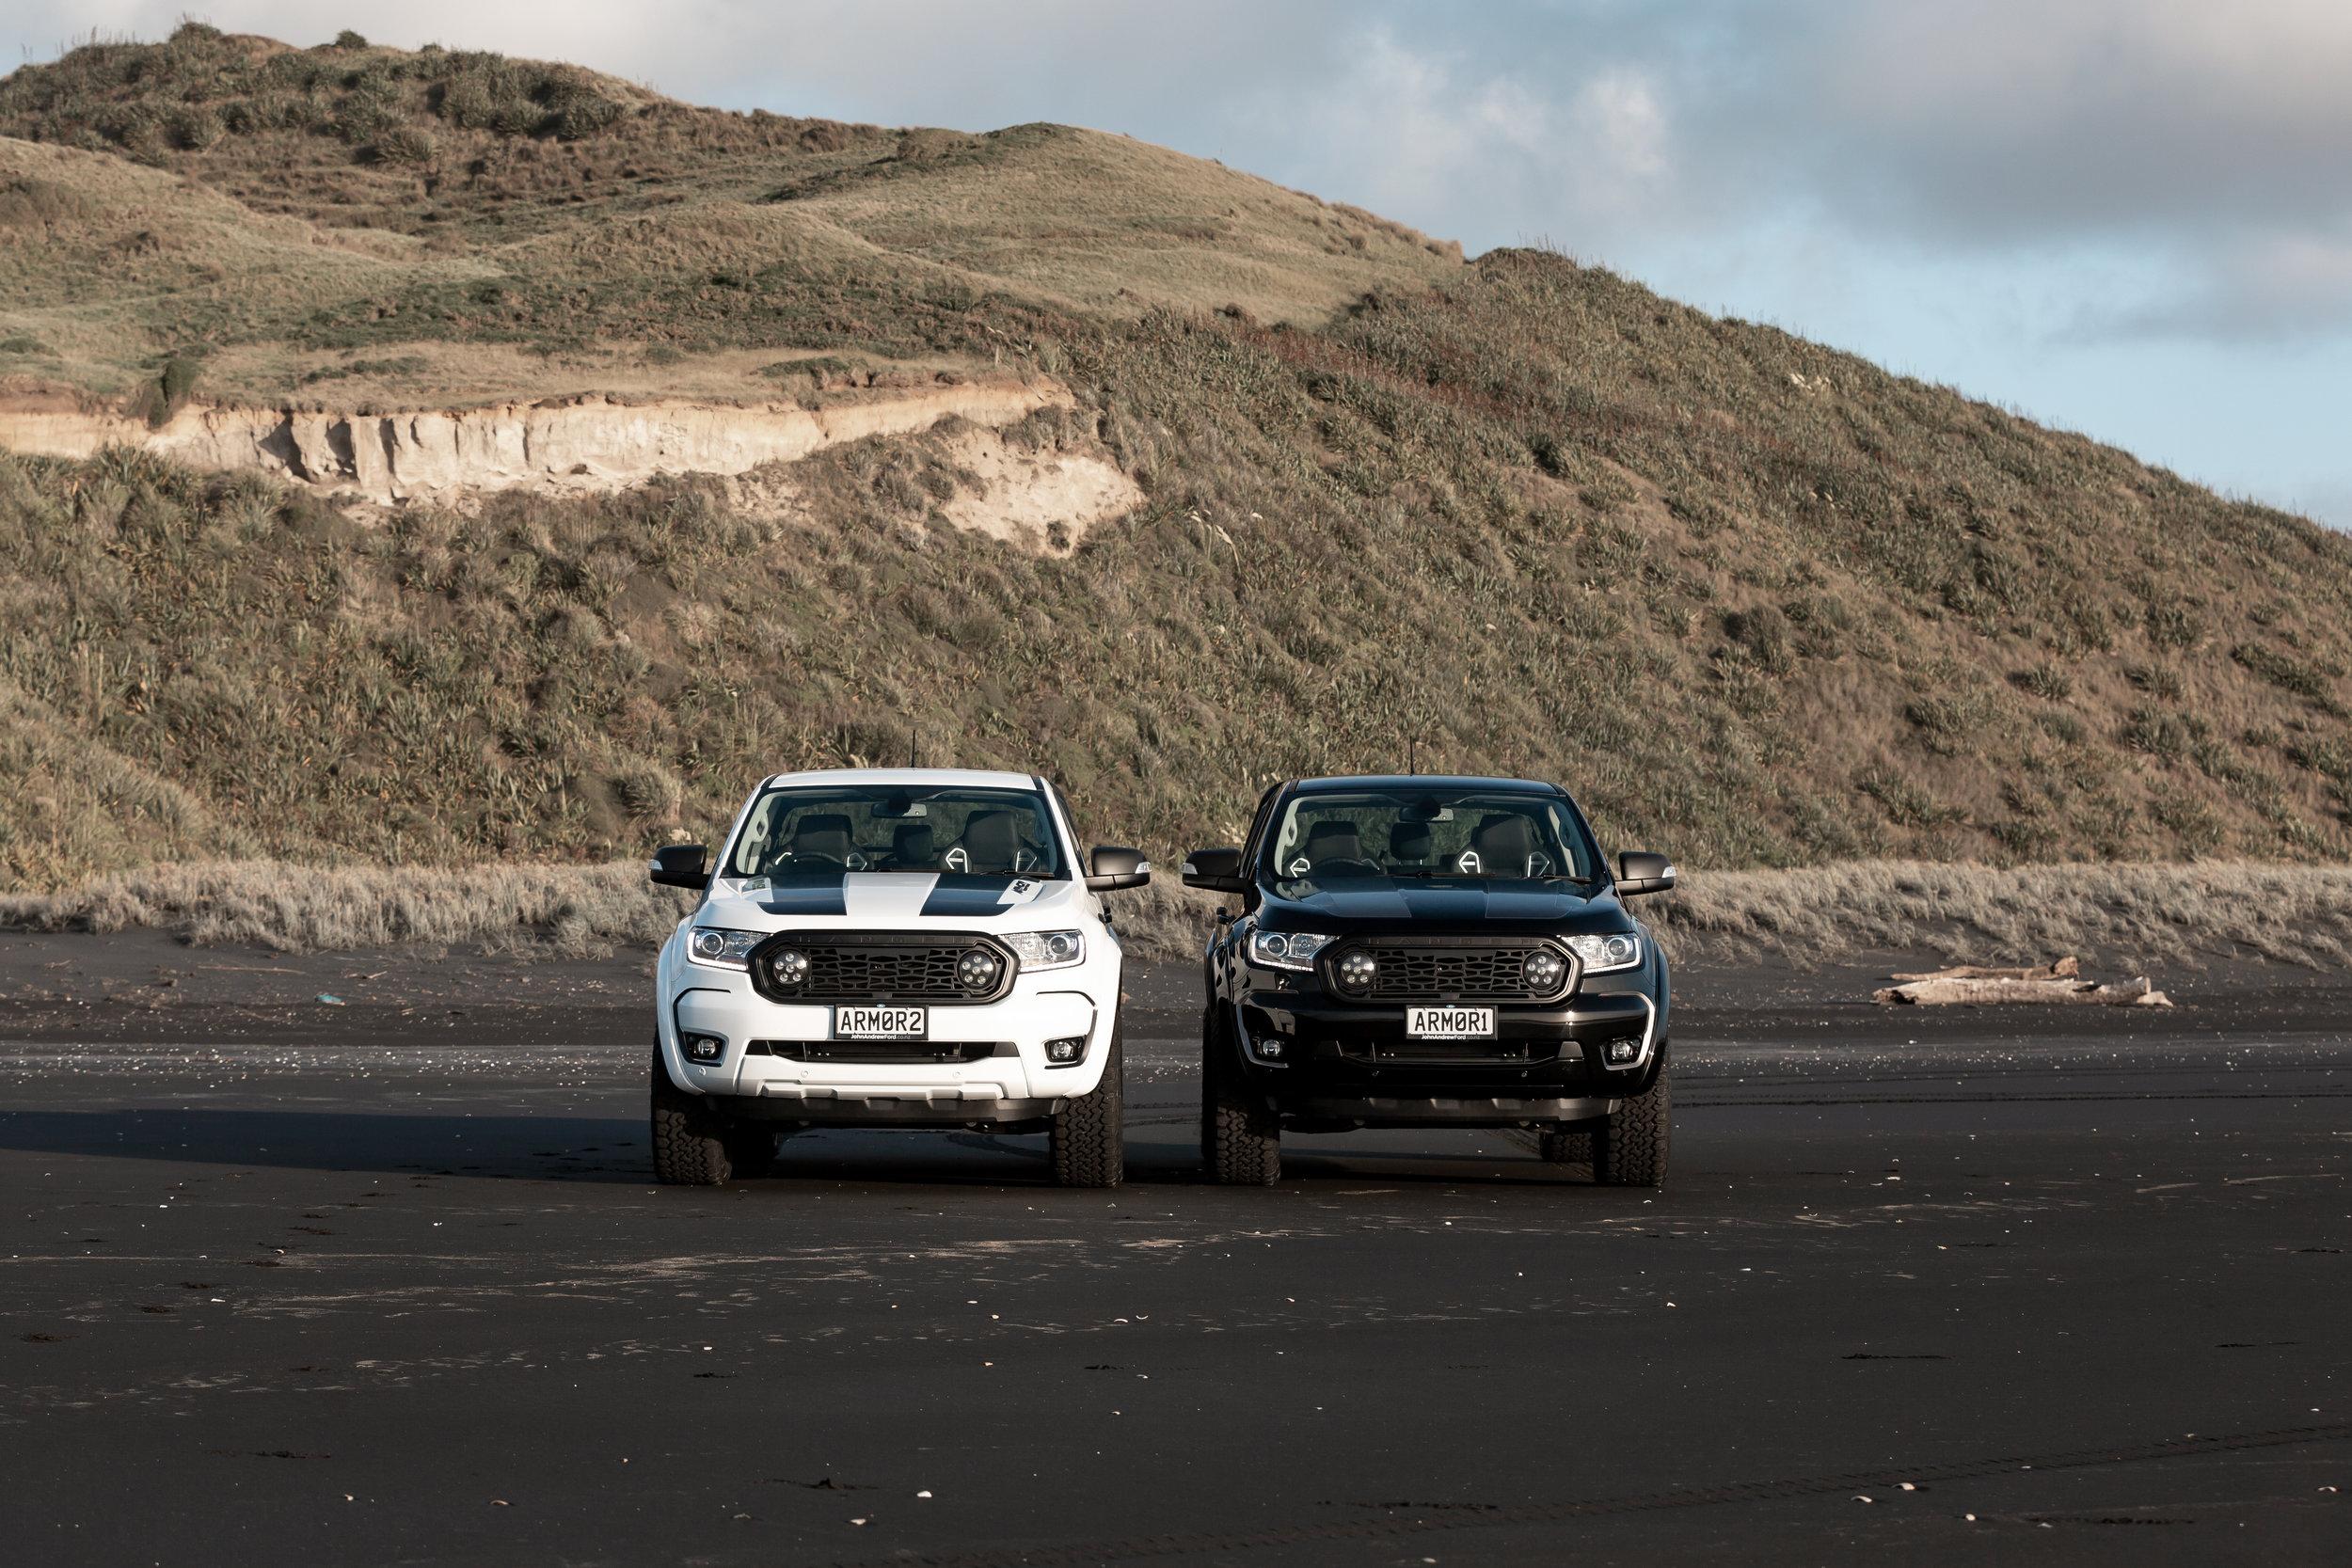 GRILLE-HERO-IMAGE-RVE-Ford-Ranger-Grille-Mesh-Upgrade-with-Spot-Lights-1.jpg